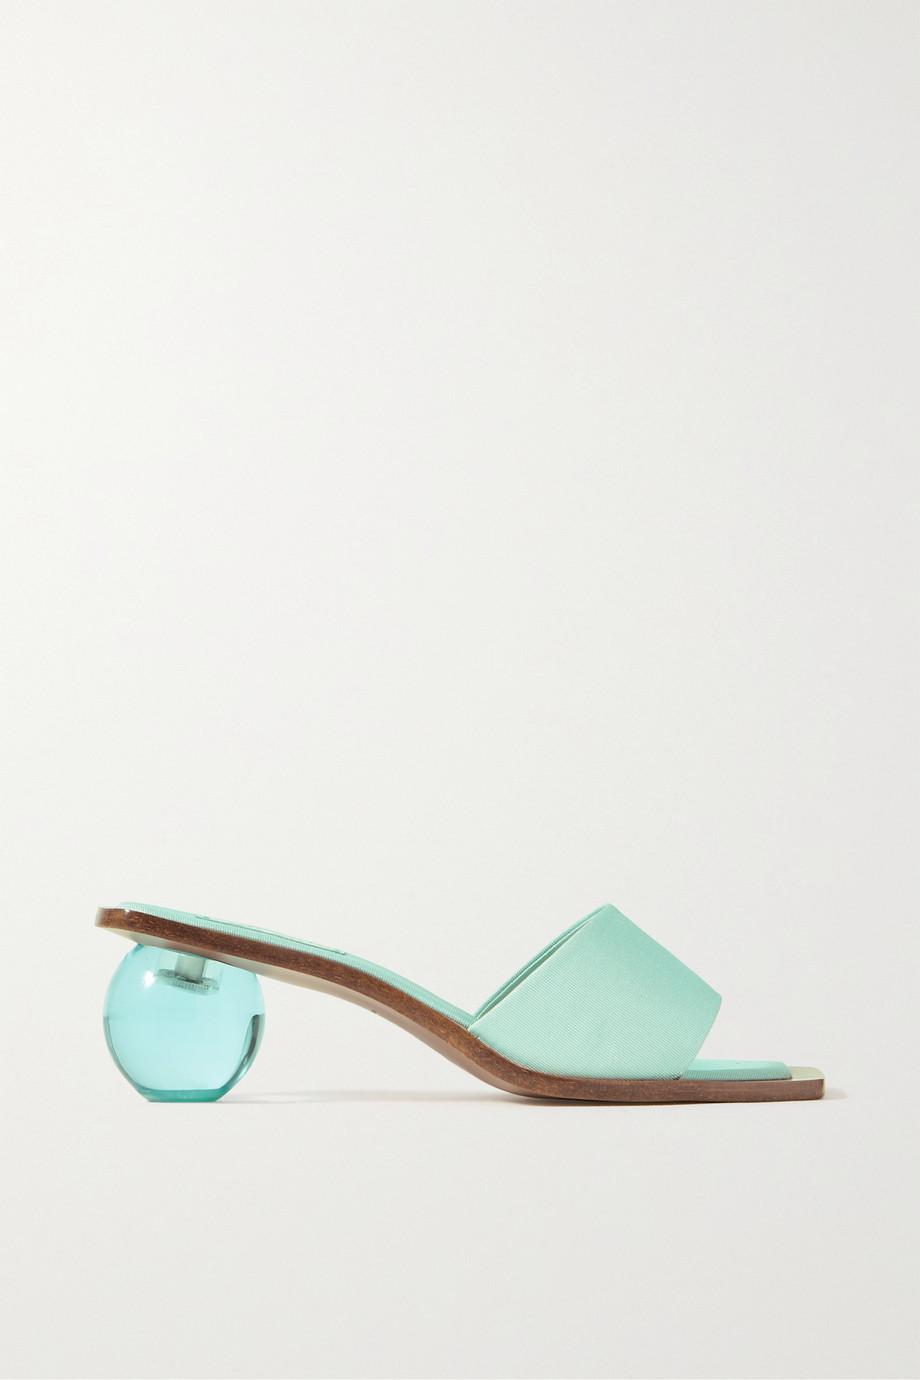 Cult Gaia Tao 罗缎凉鞋